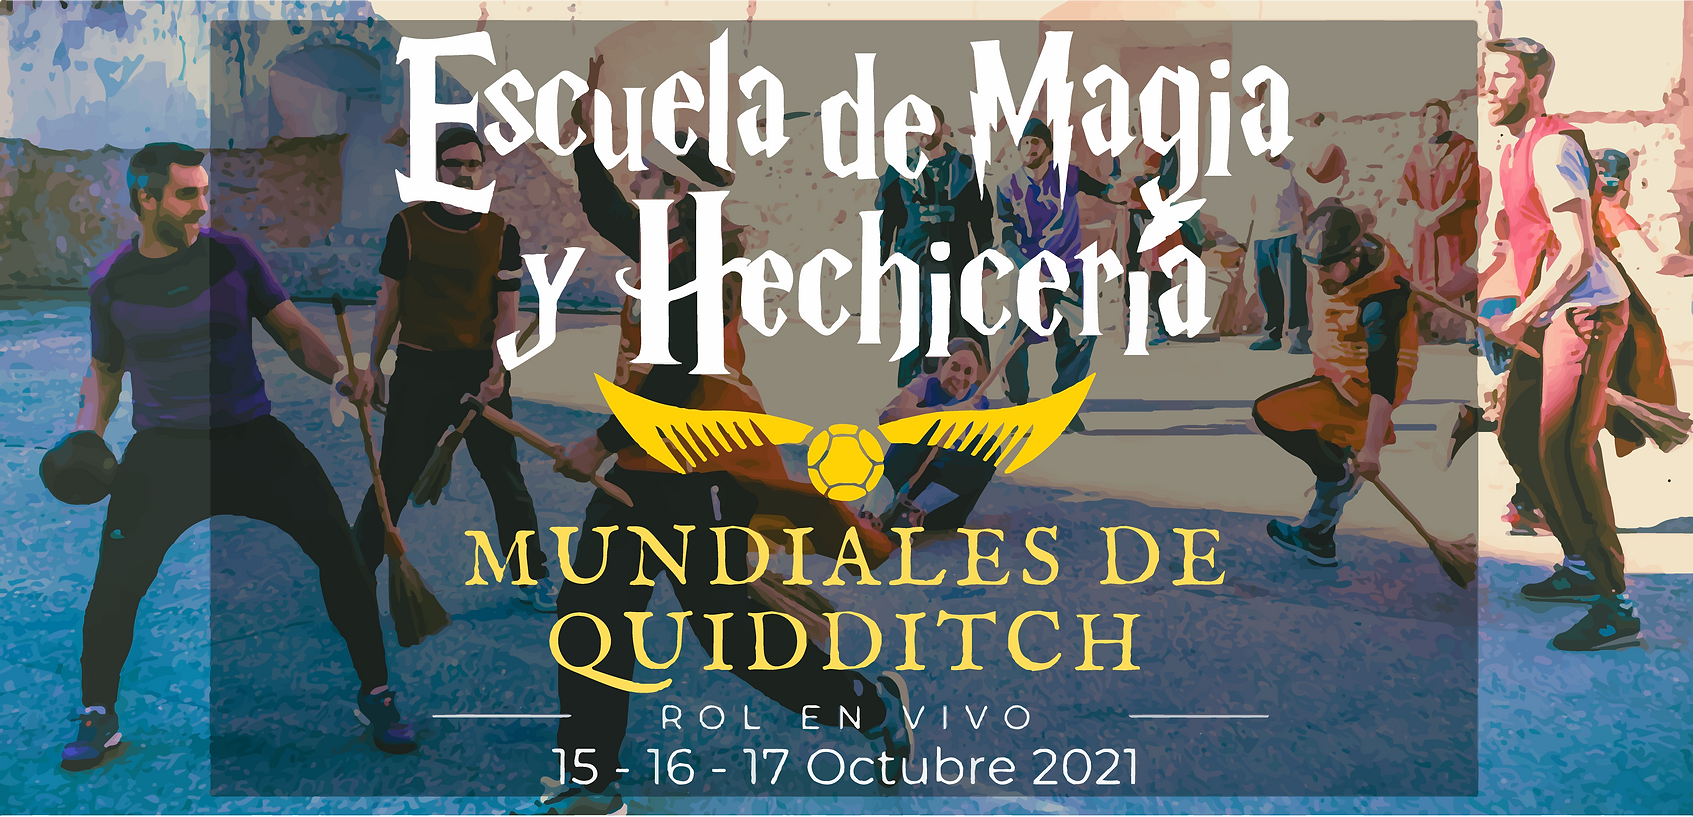 Mundiales de Quidditch - Banner.png